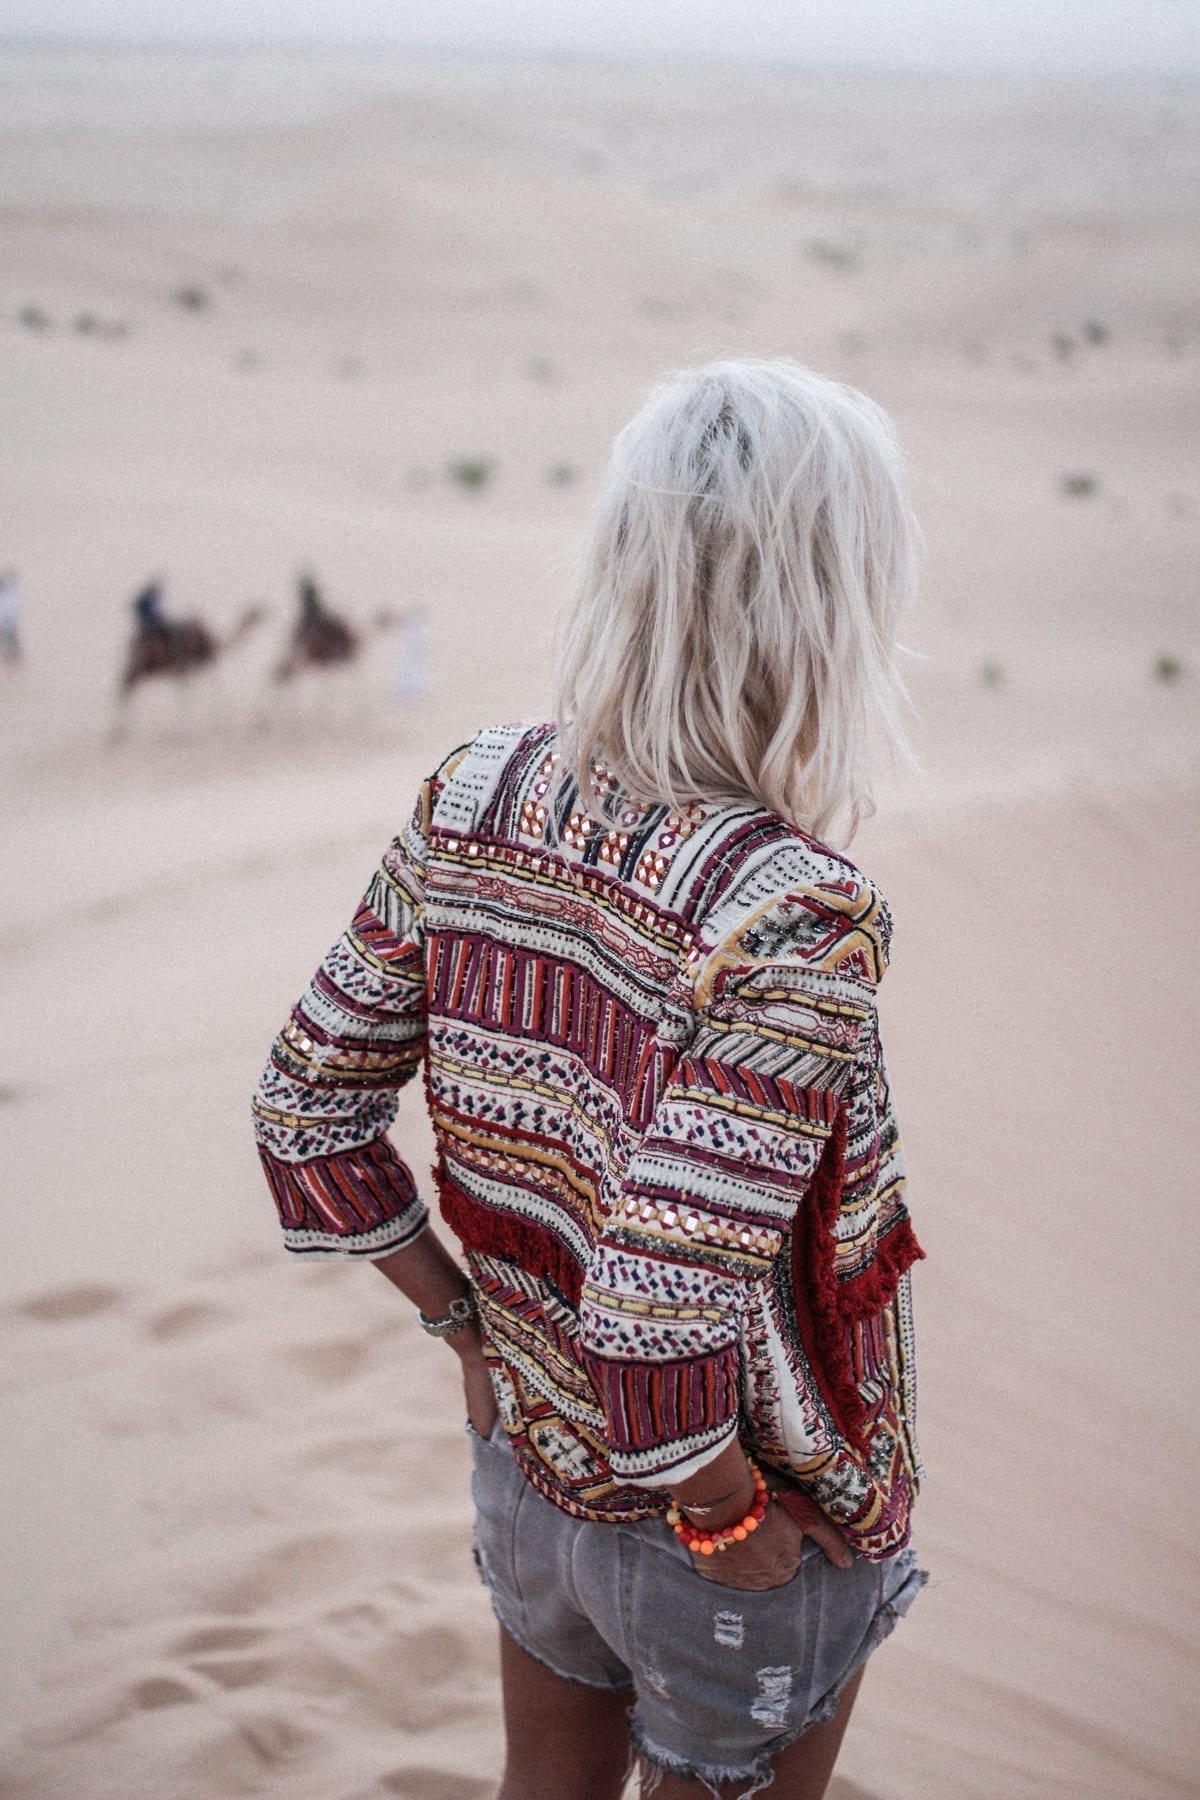 CK_1604_Constantly-K-Abu-Dhabi-desert-faschion-Shooting-5349